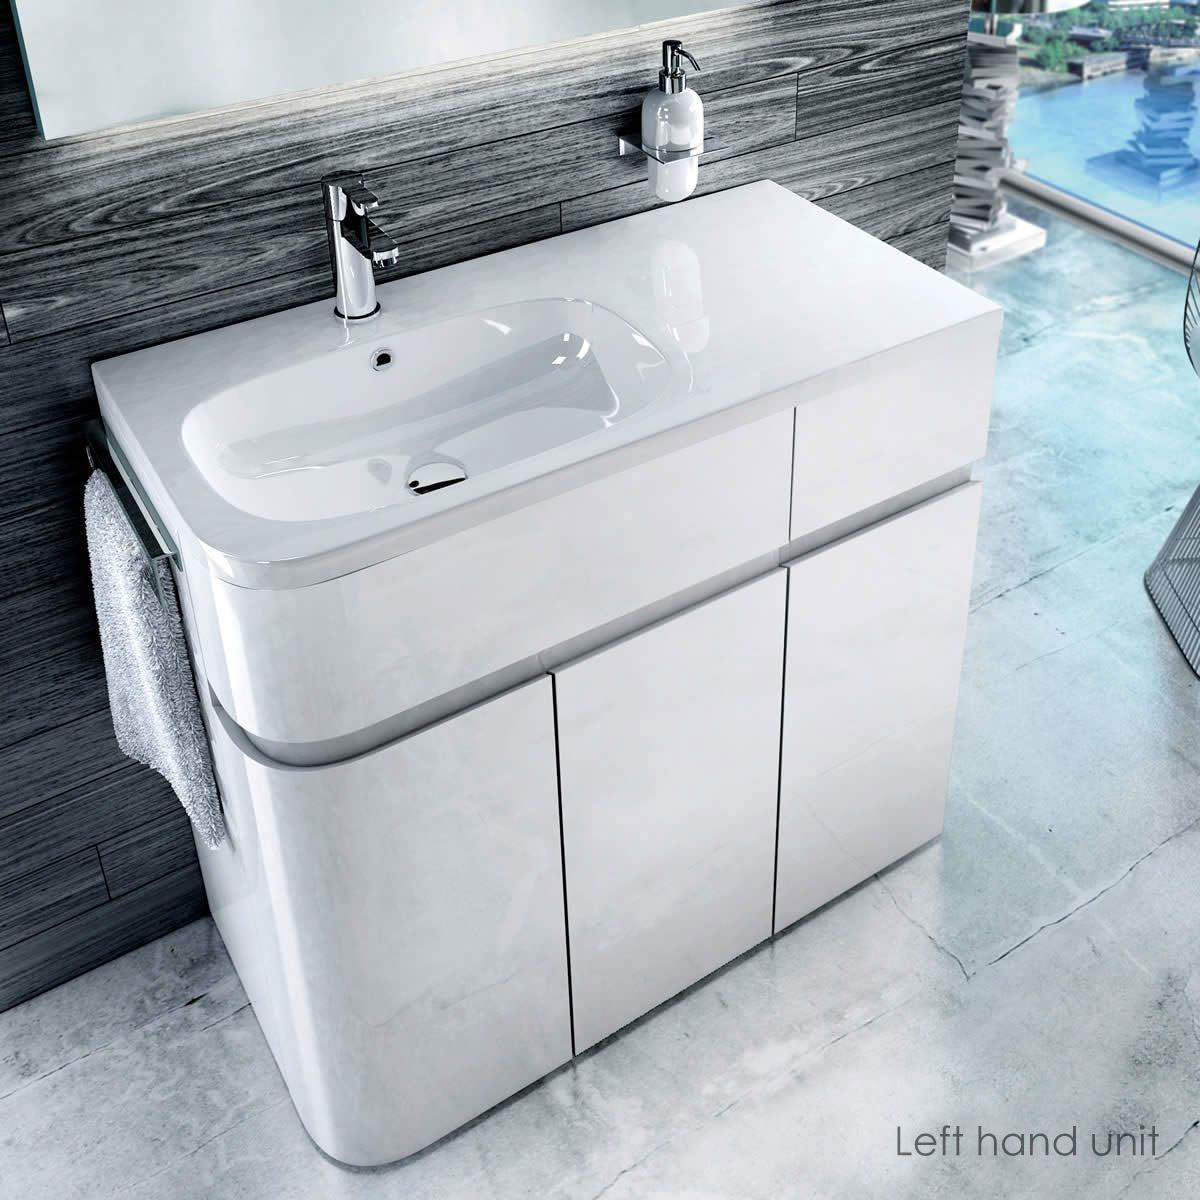 Britton Aqua Cabinets D450 Arc White 900mm Lh Cabinet With